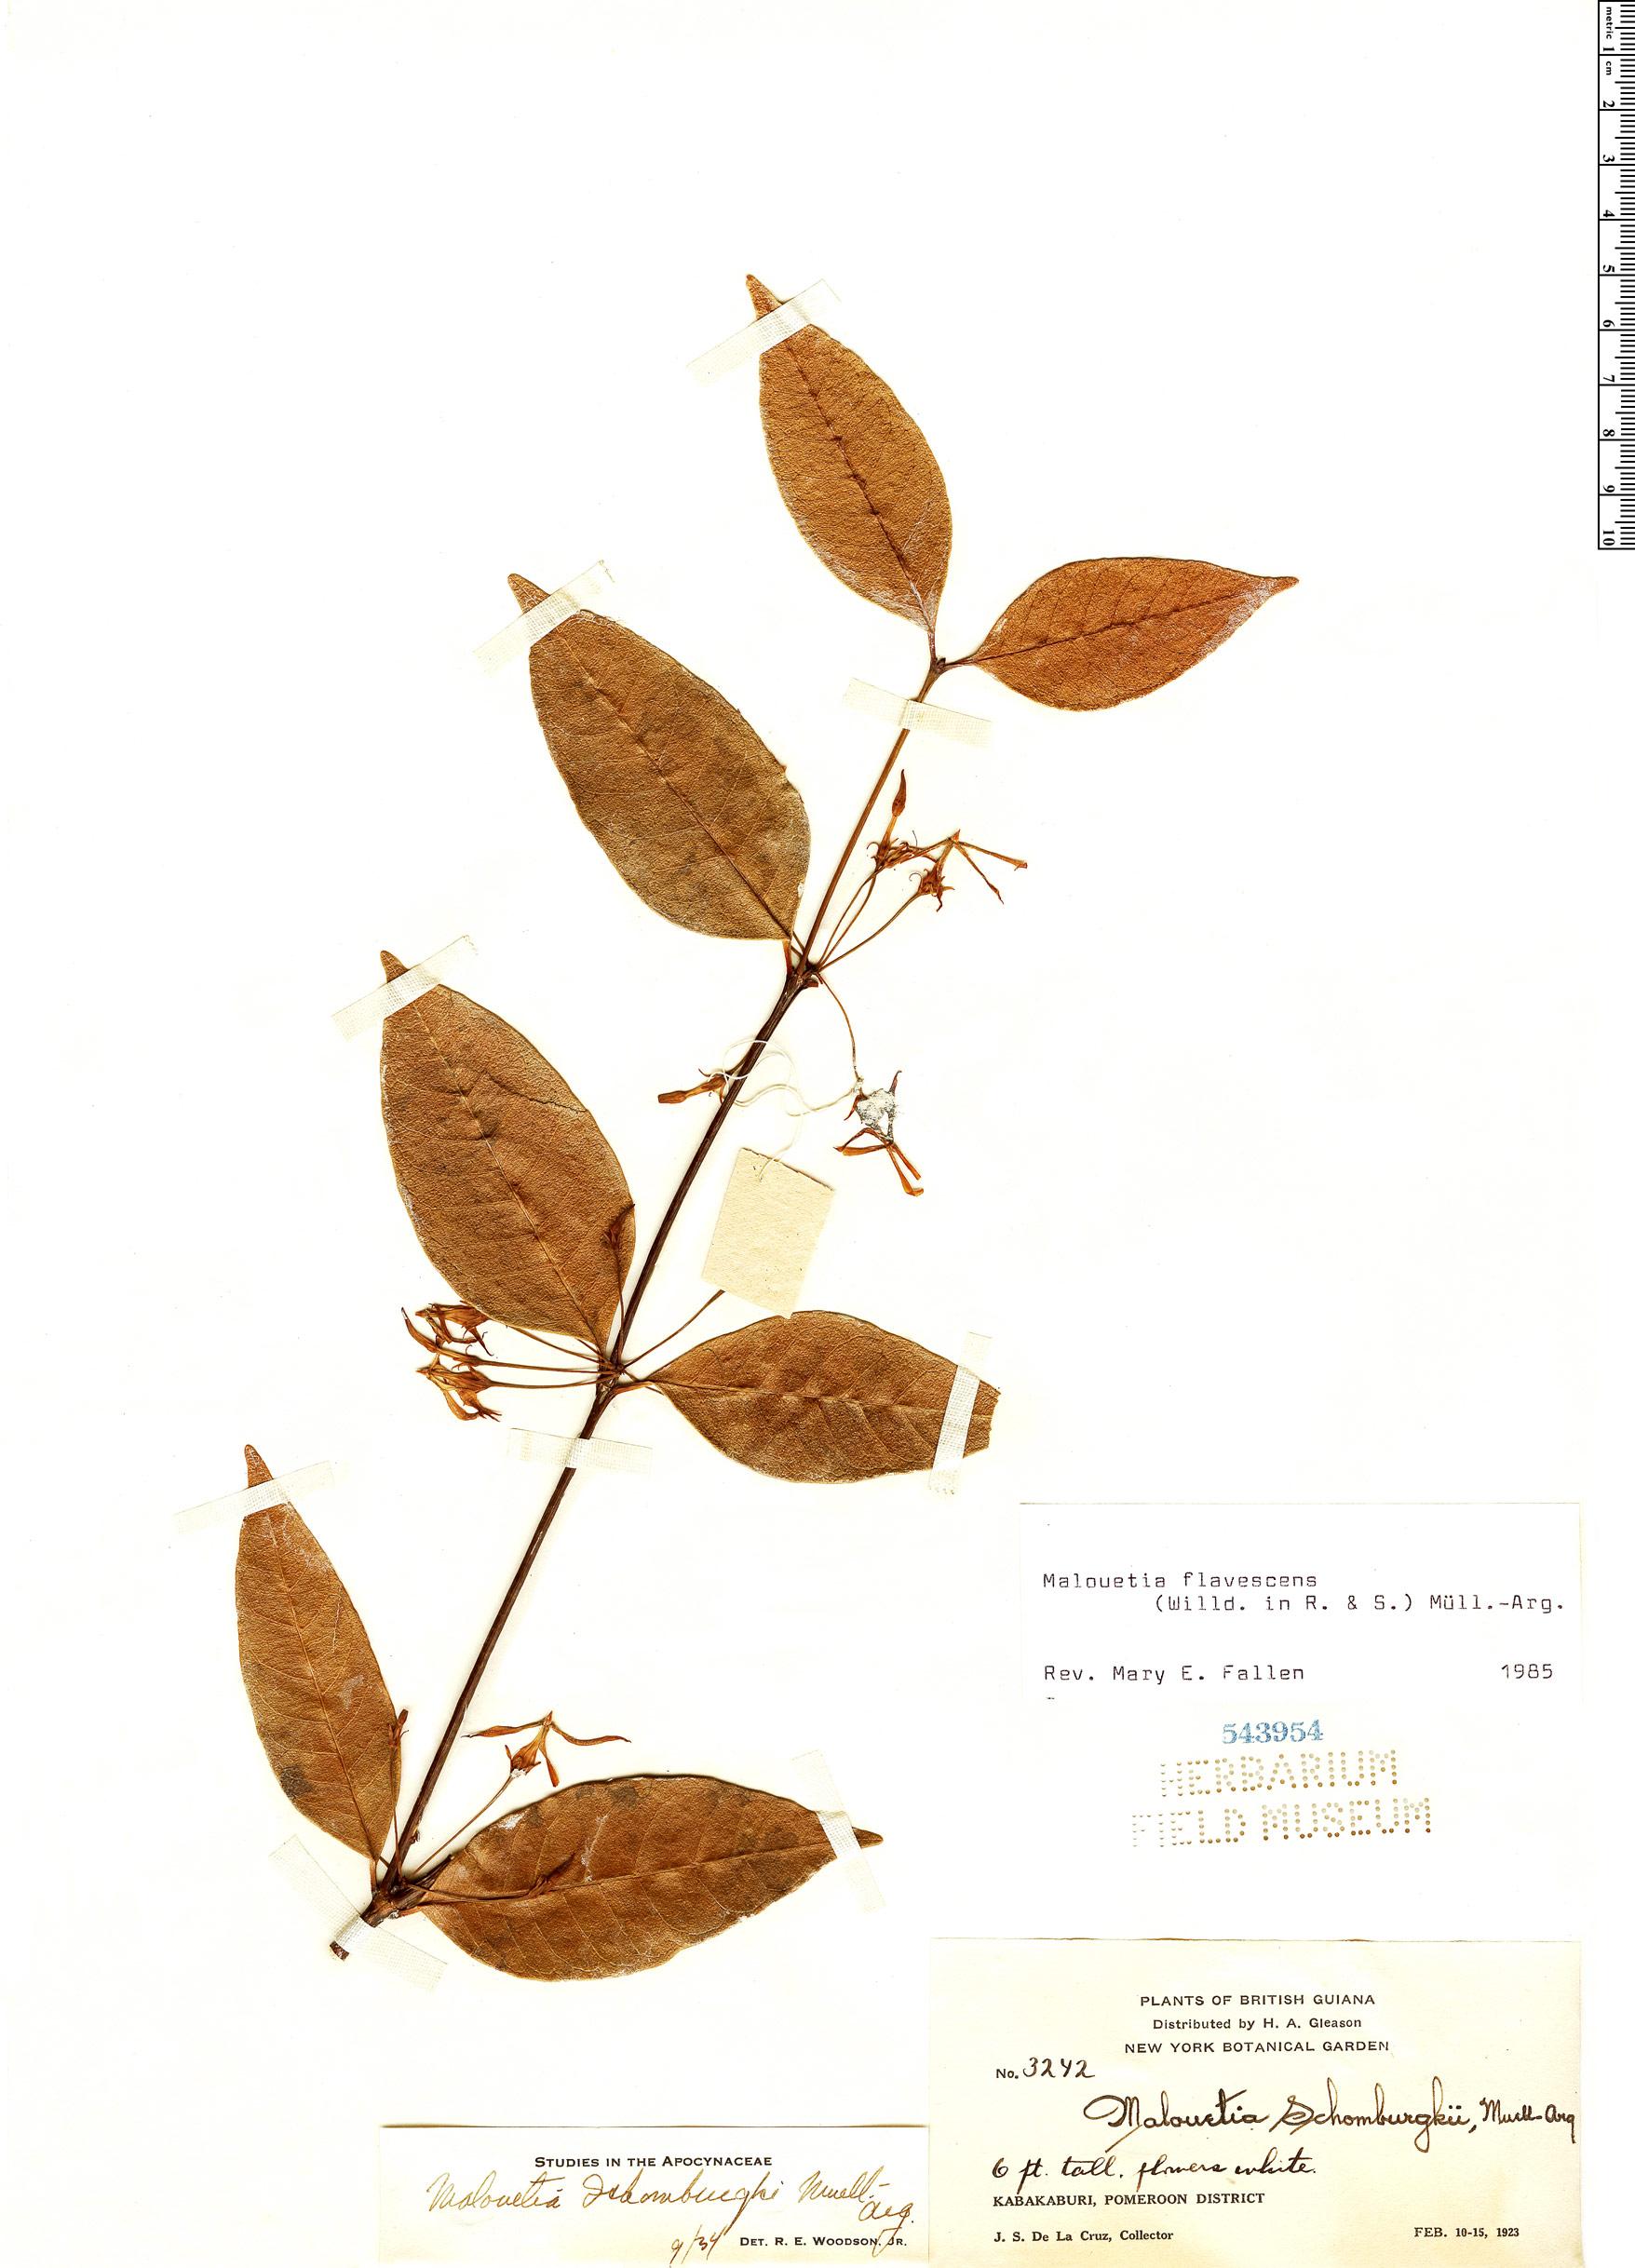 Specimen: Malouetia flavescens